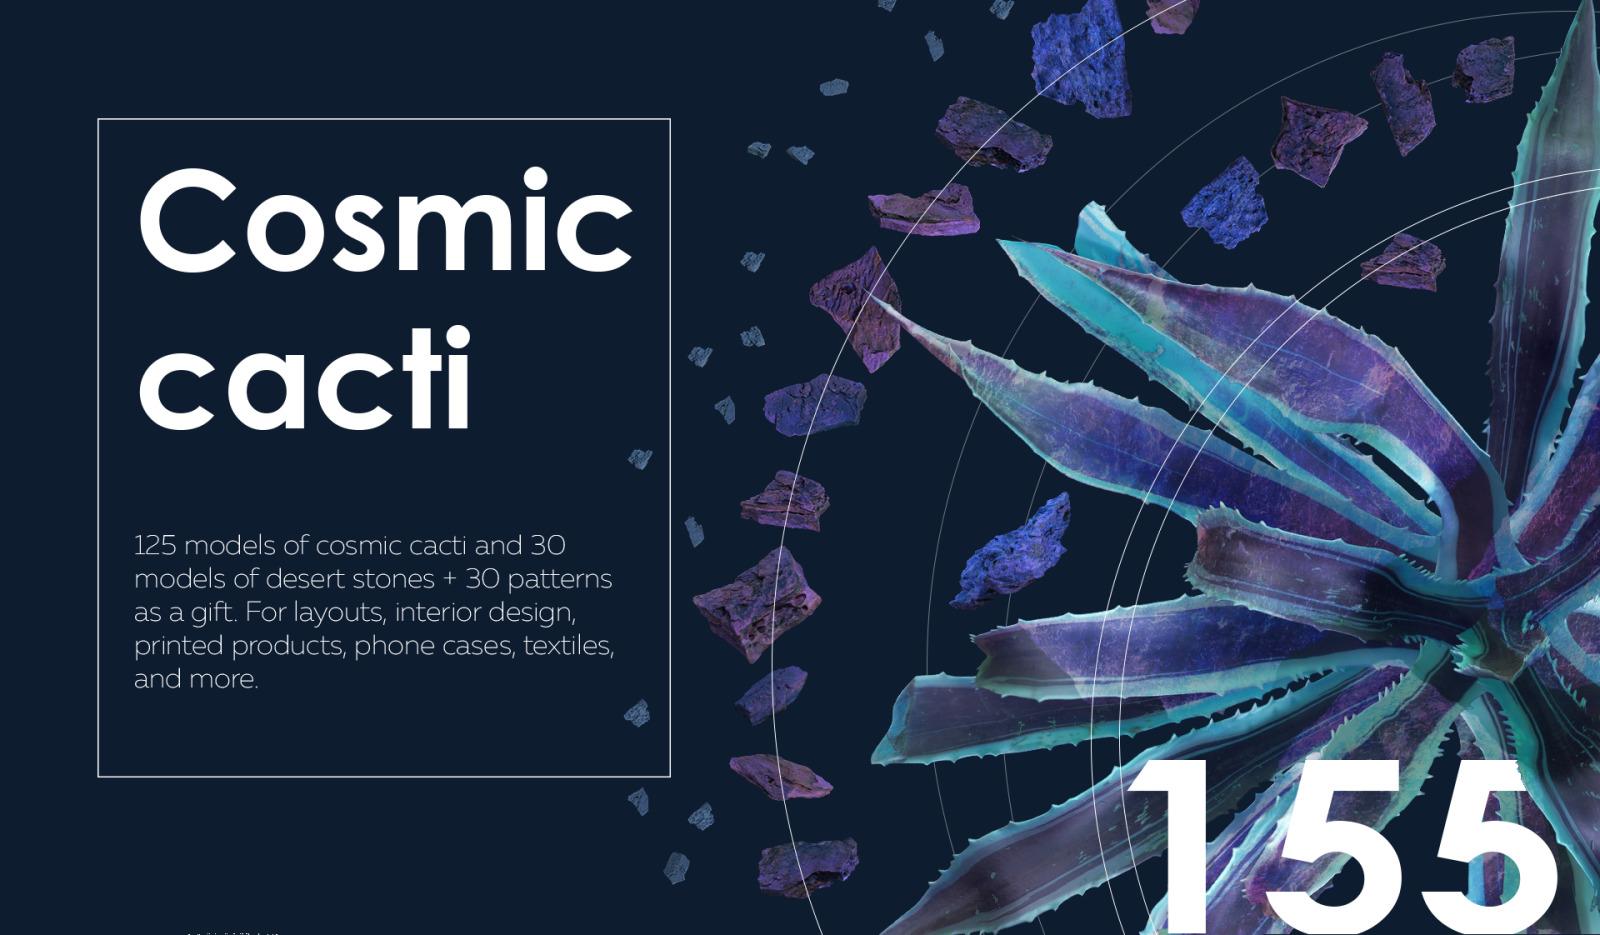 Cosmic cacti #01, 125 cactus and 30 rock mockups + 35 patterns